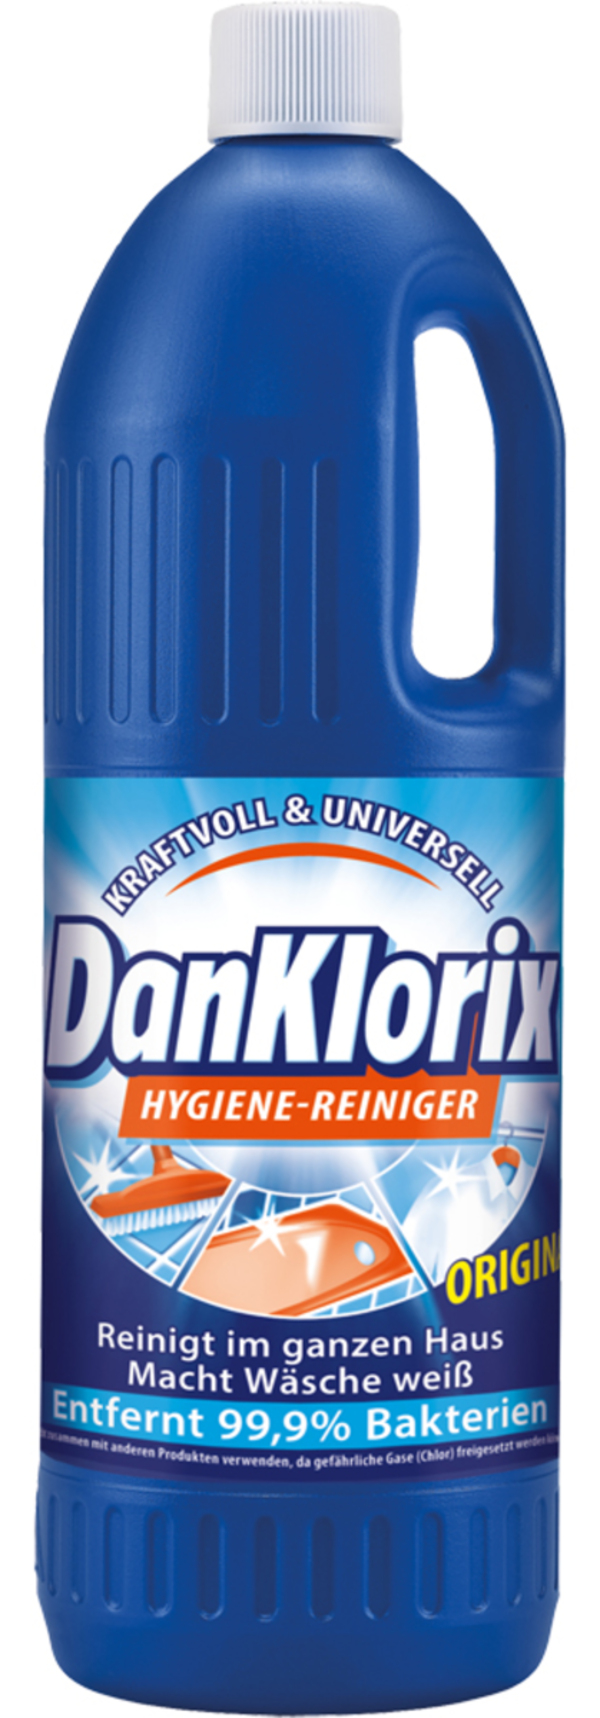 DanKlorix Hygienereiniger Original 1,5 ltr